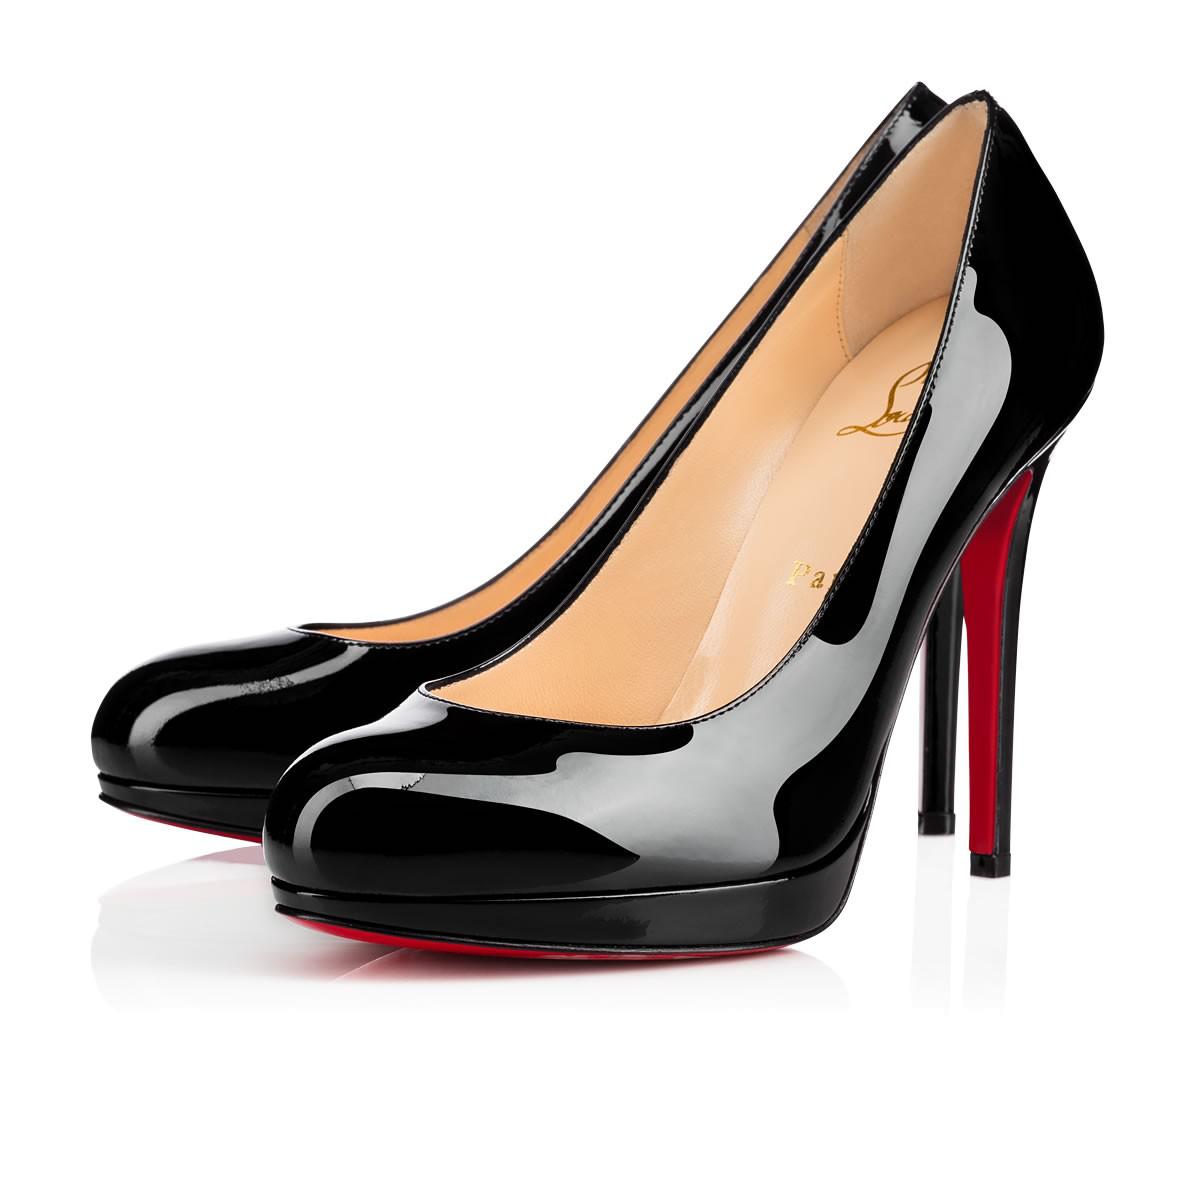 be23ea0bdc74 Christian Louboutin Bianca Almond-Toe Platform Red Sole Pump In Black